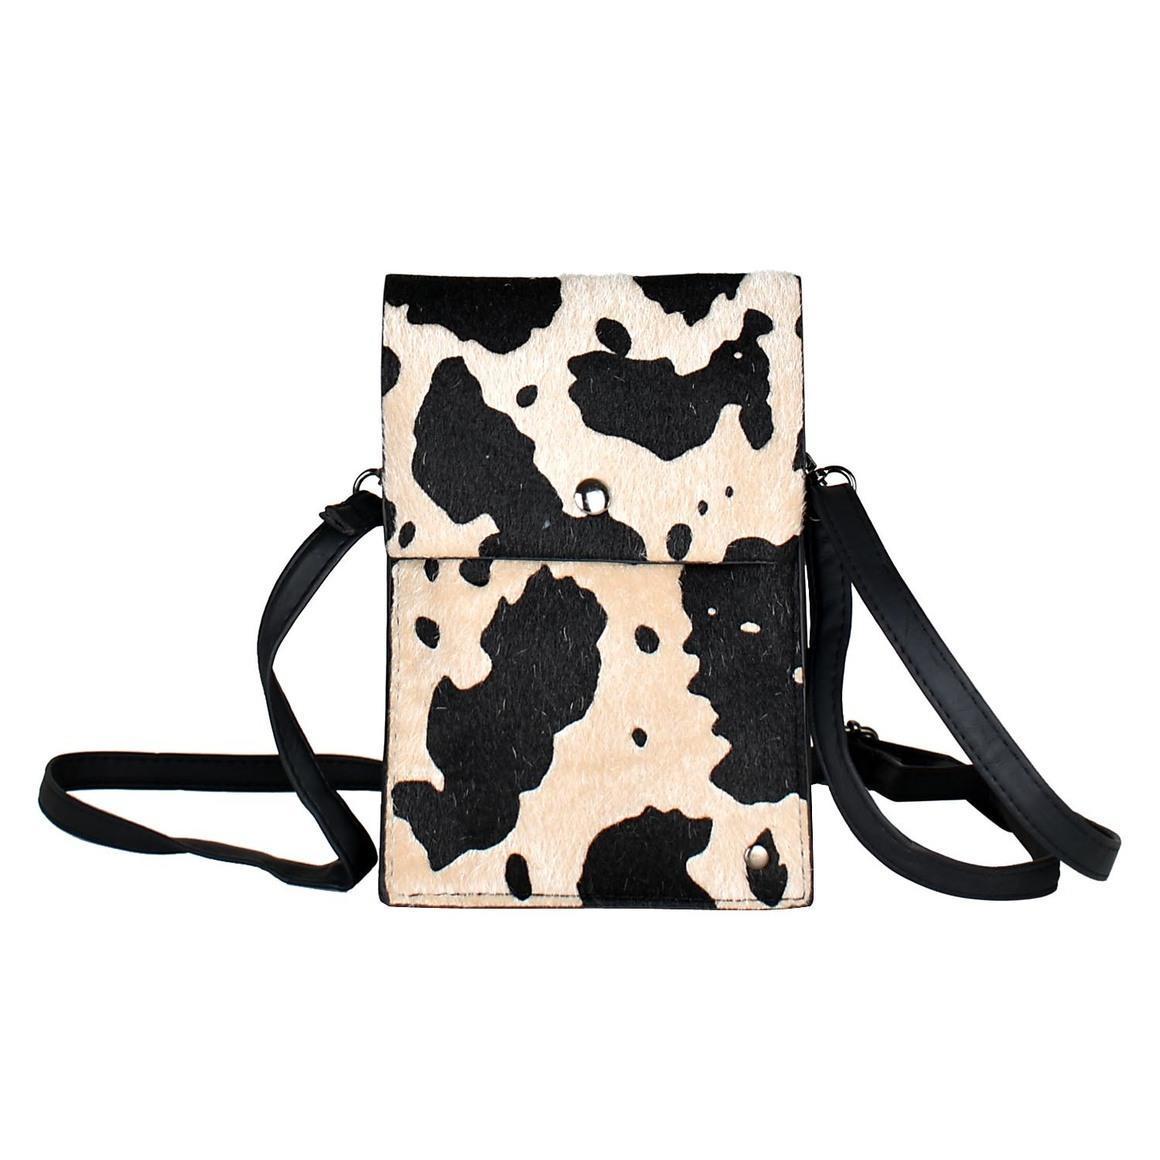 THSB1009: Brown: Animal Print Cross Bag | Trada Marketplace